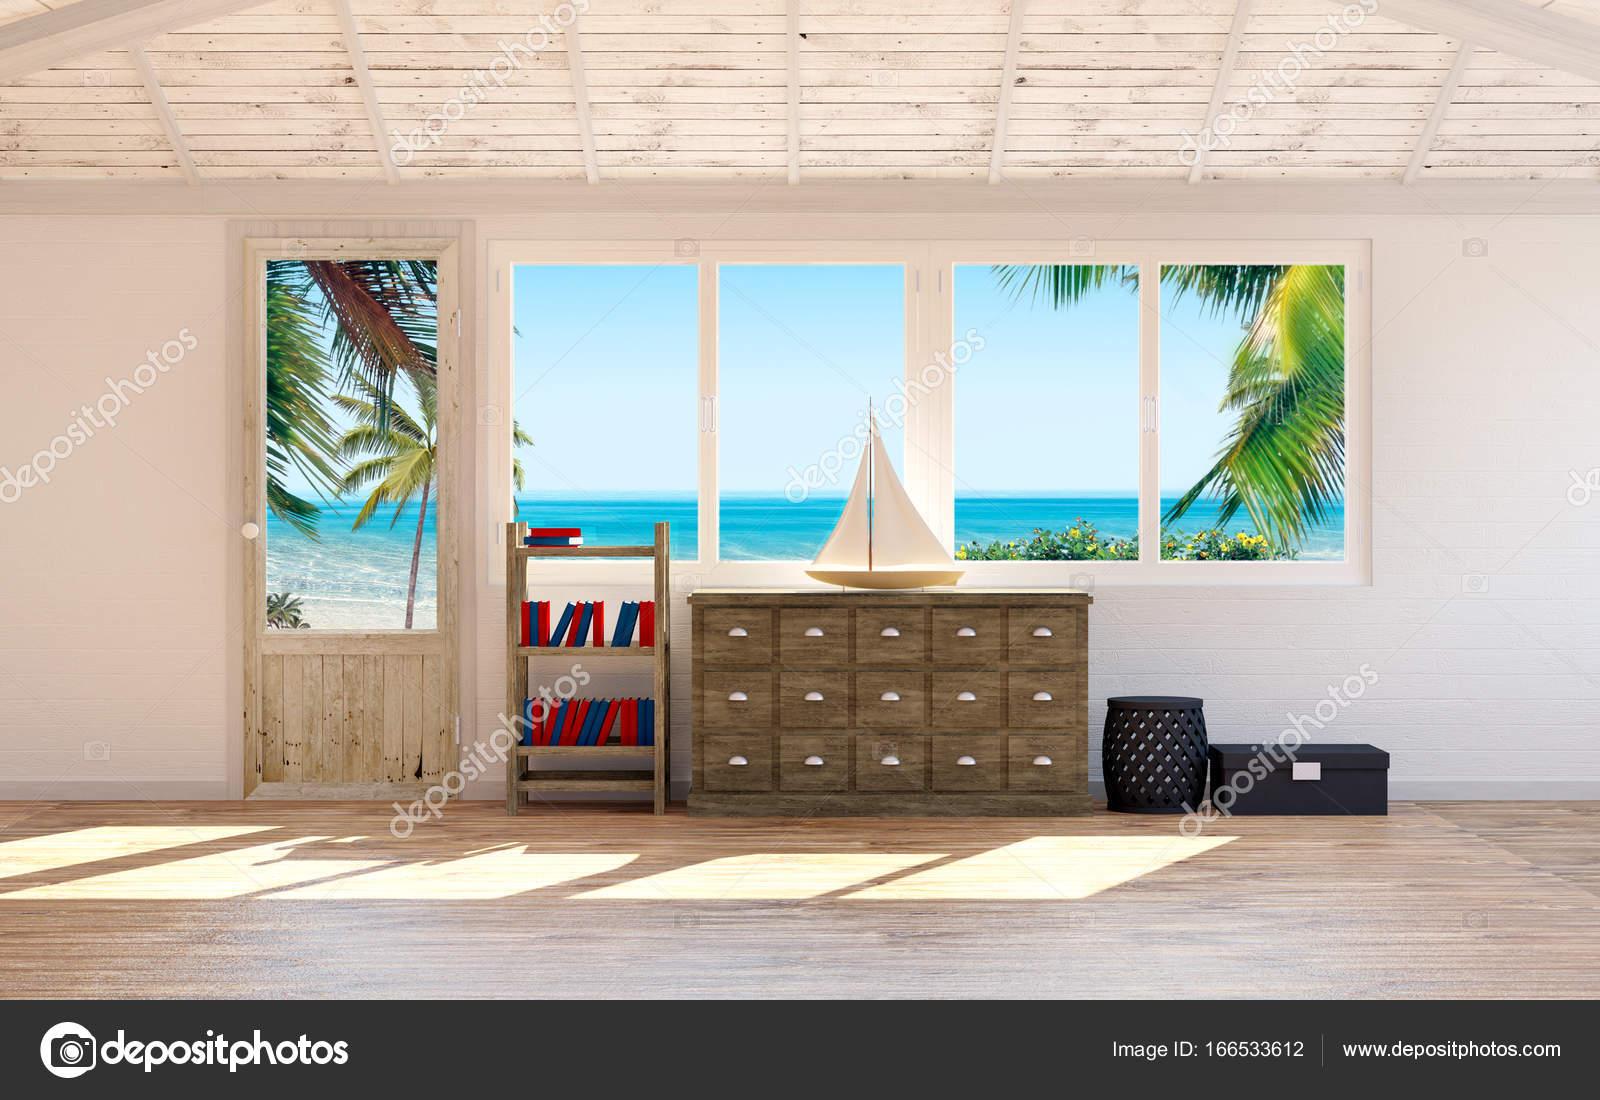 Strandlook Interieur Inspiratie : Agentz interieur stijlen blauw wit beach strand riverdale beach